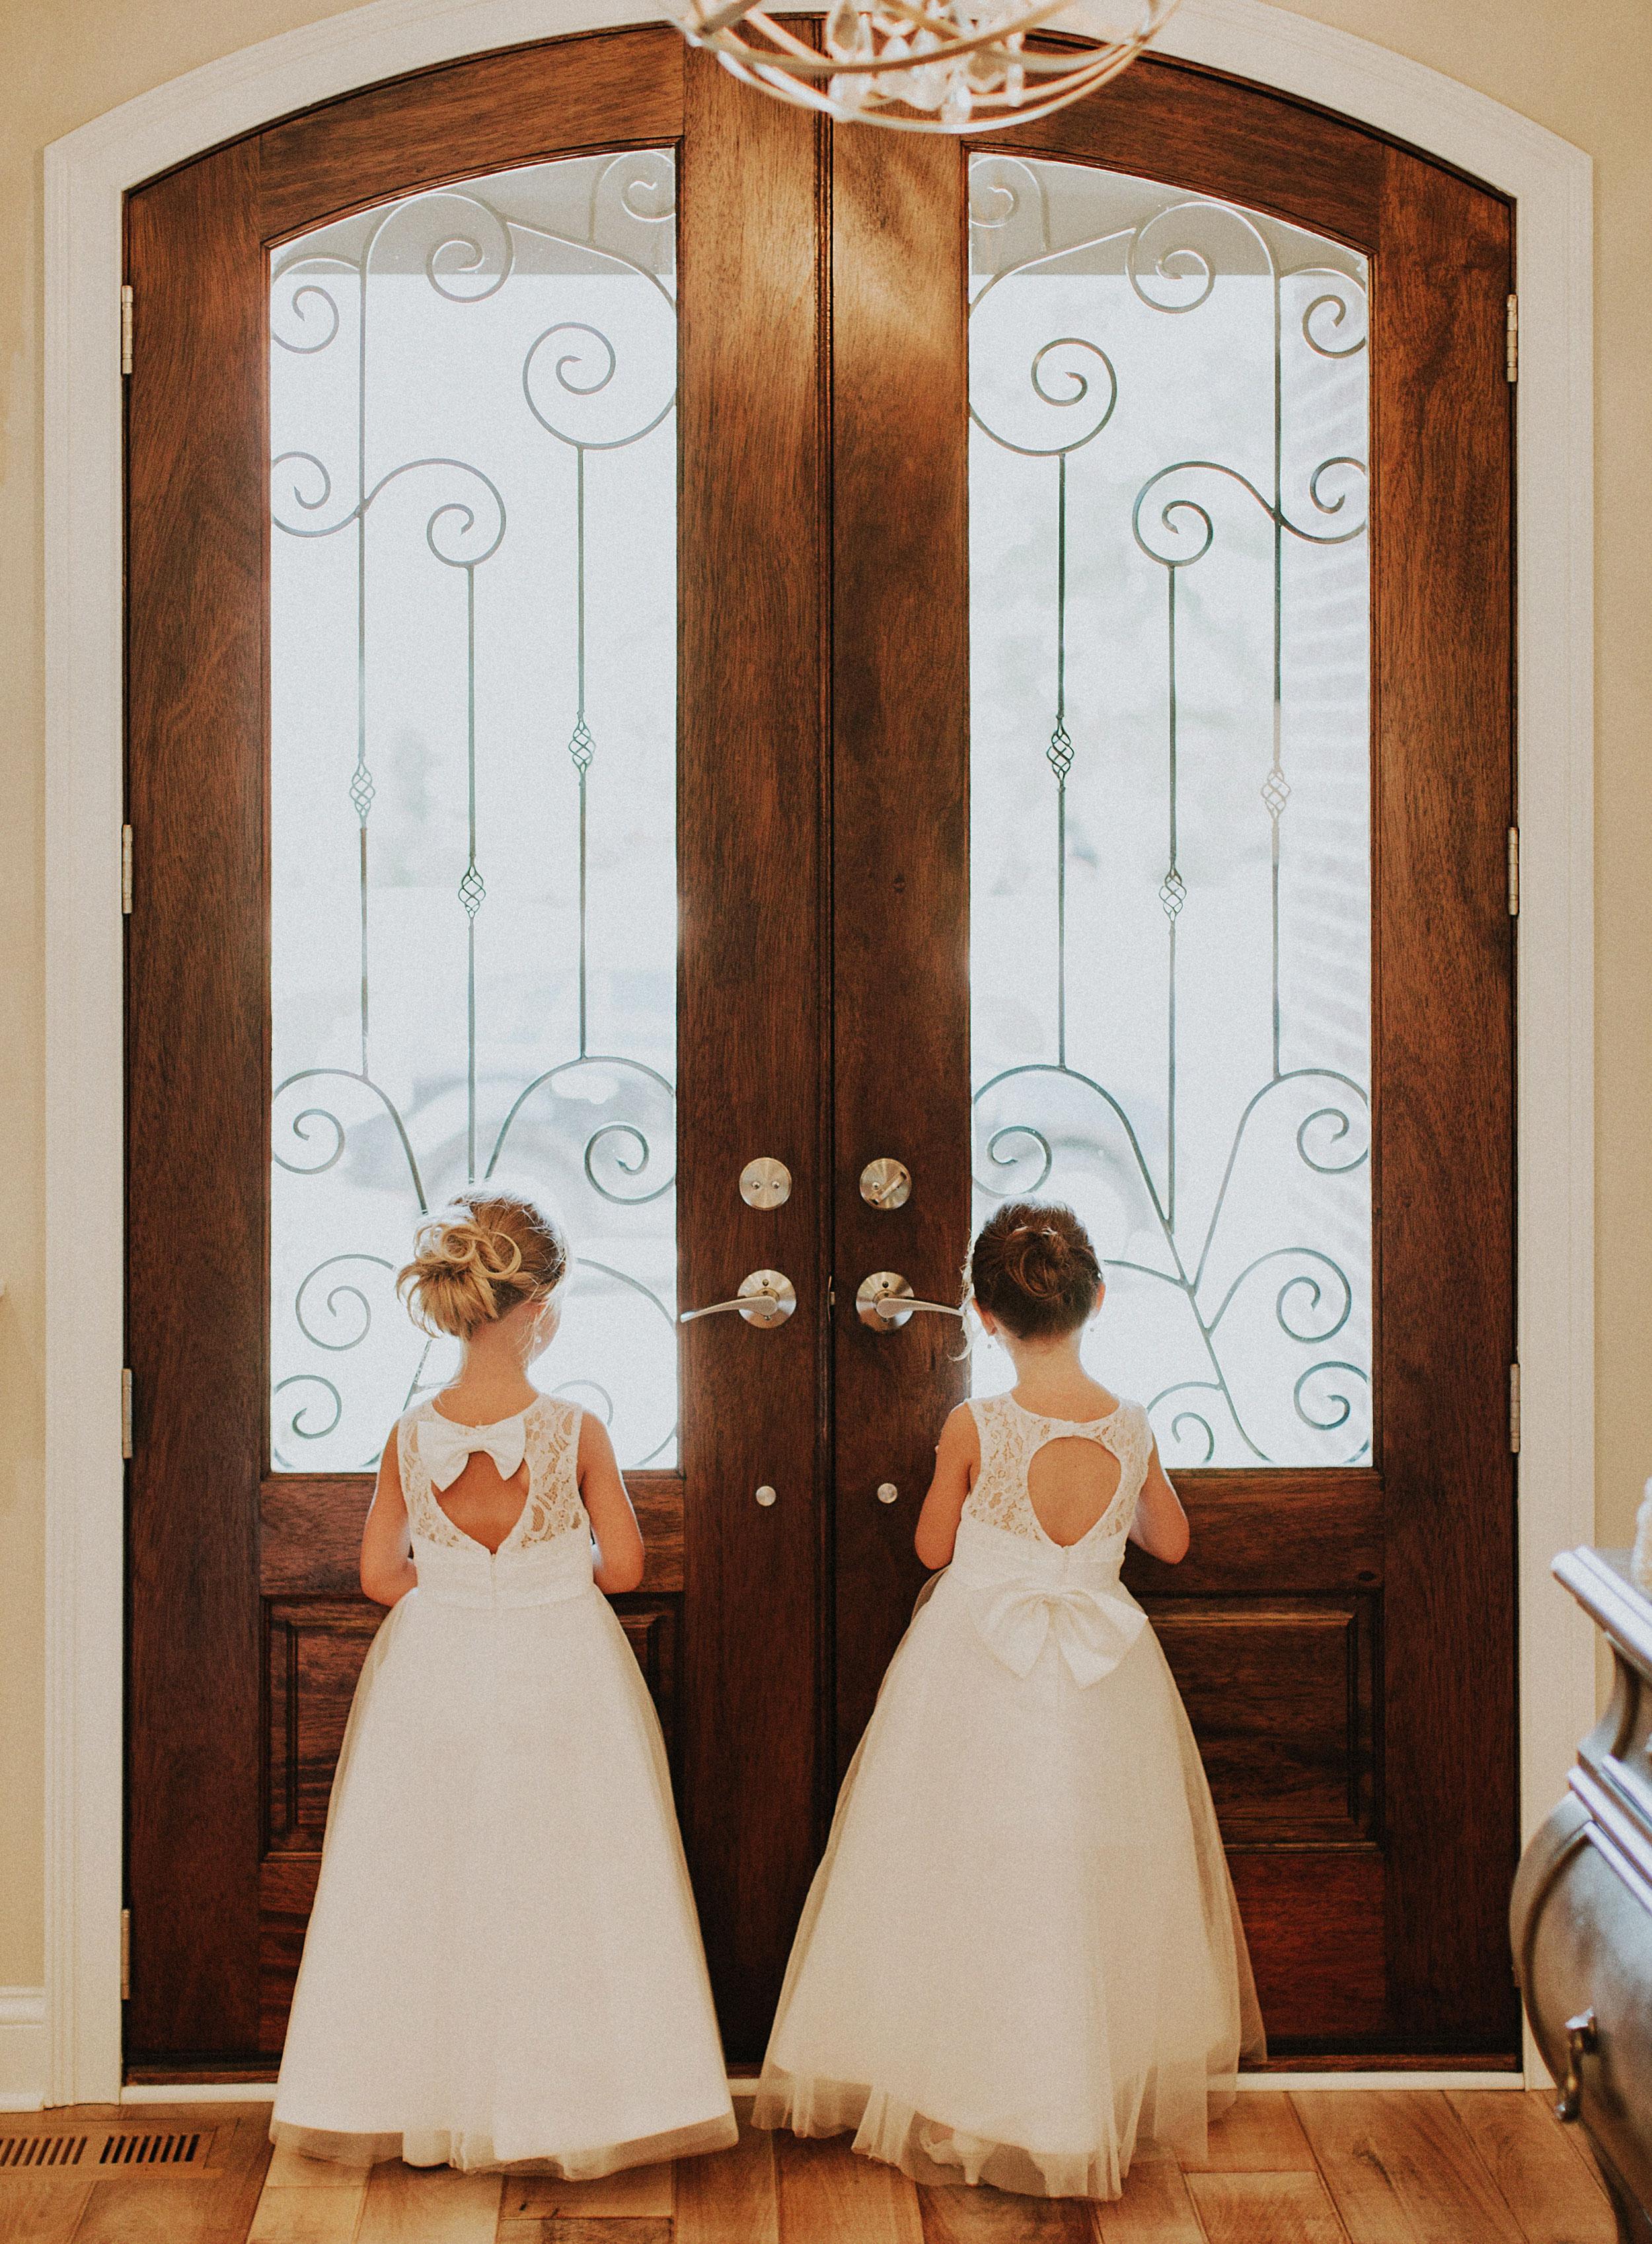 olmsted-wedding-louisville-kentucky-014.JPG